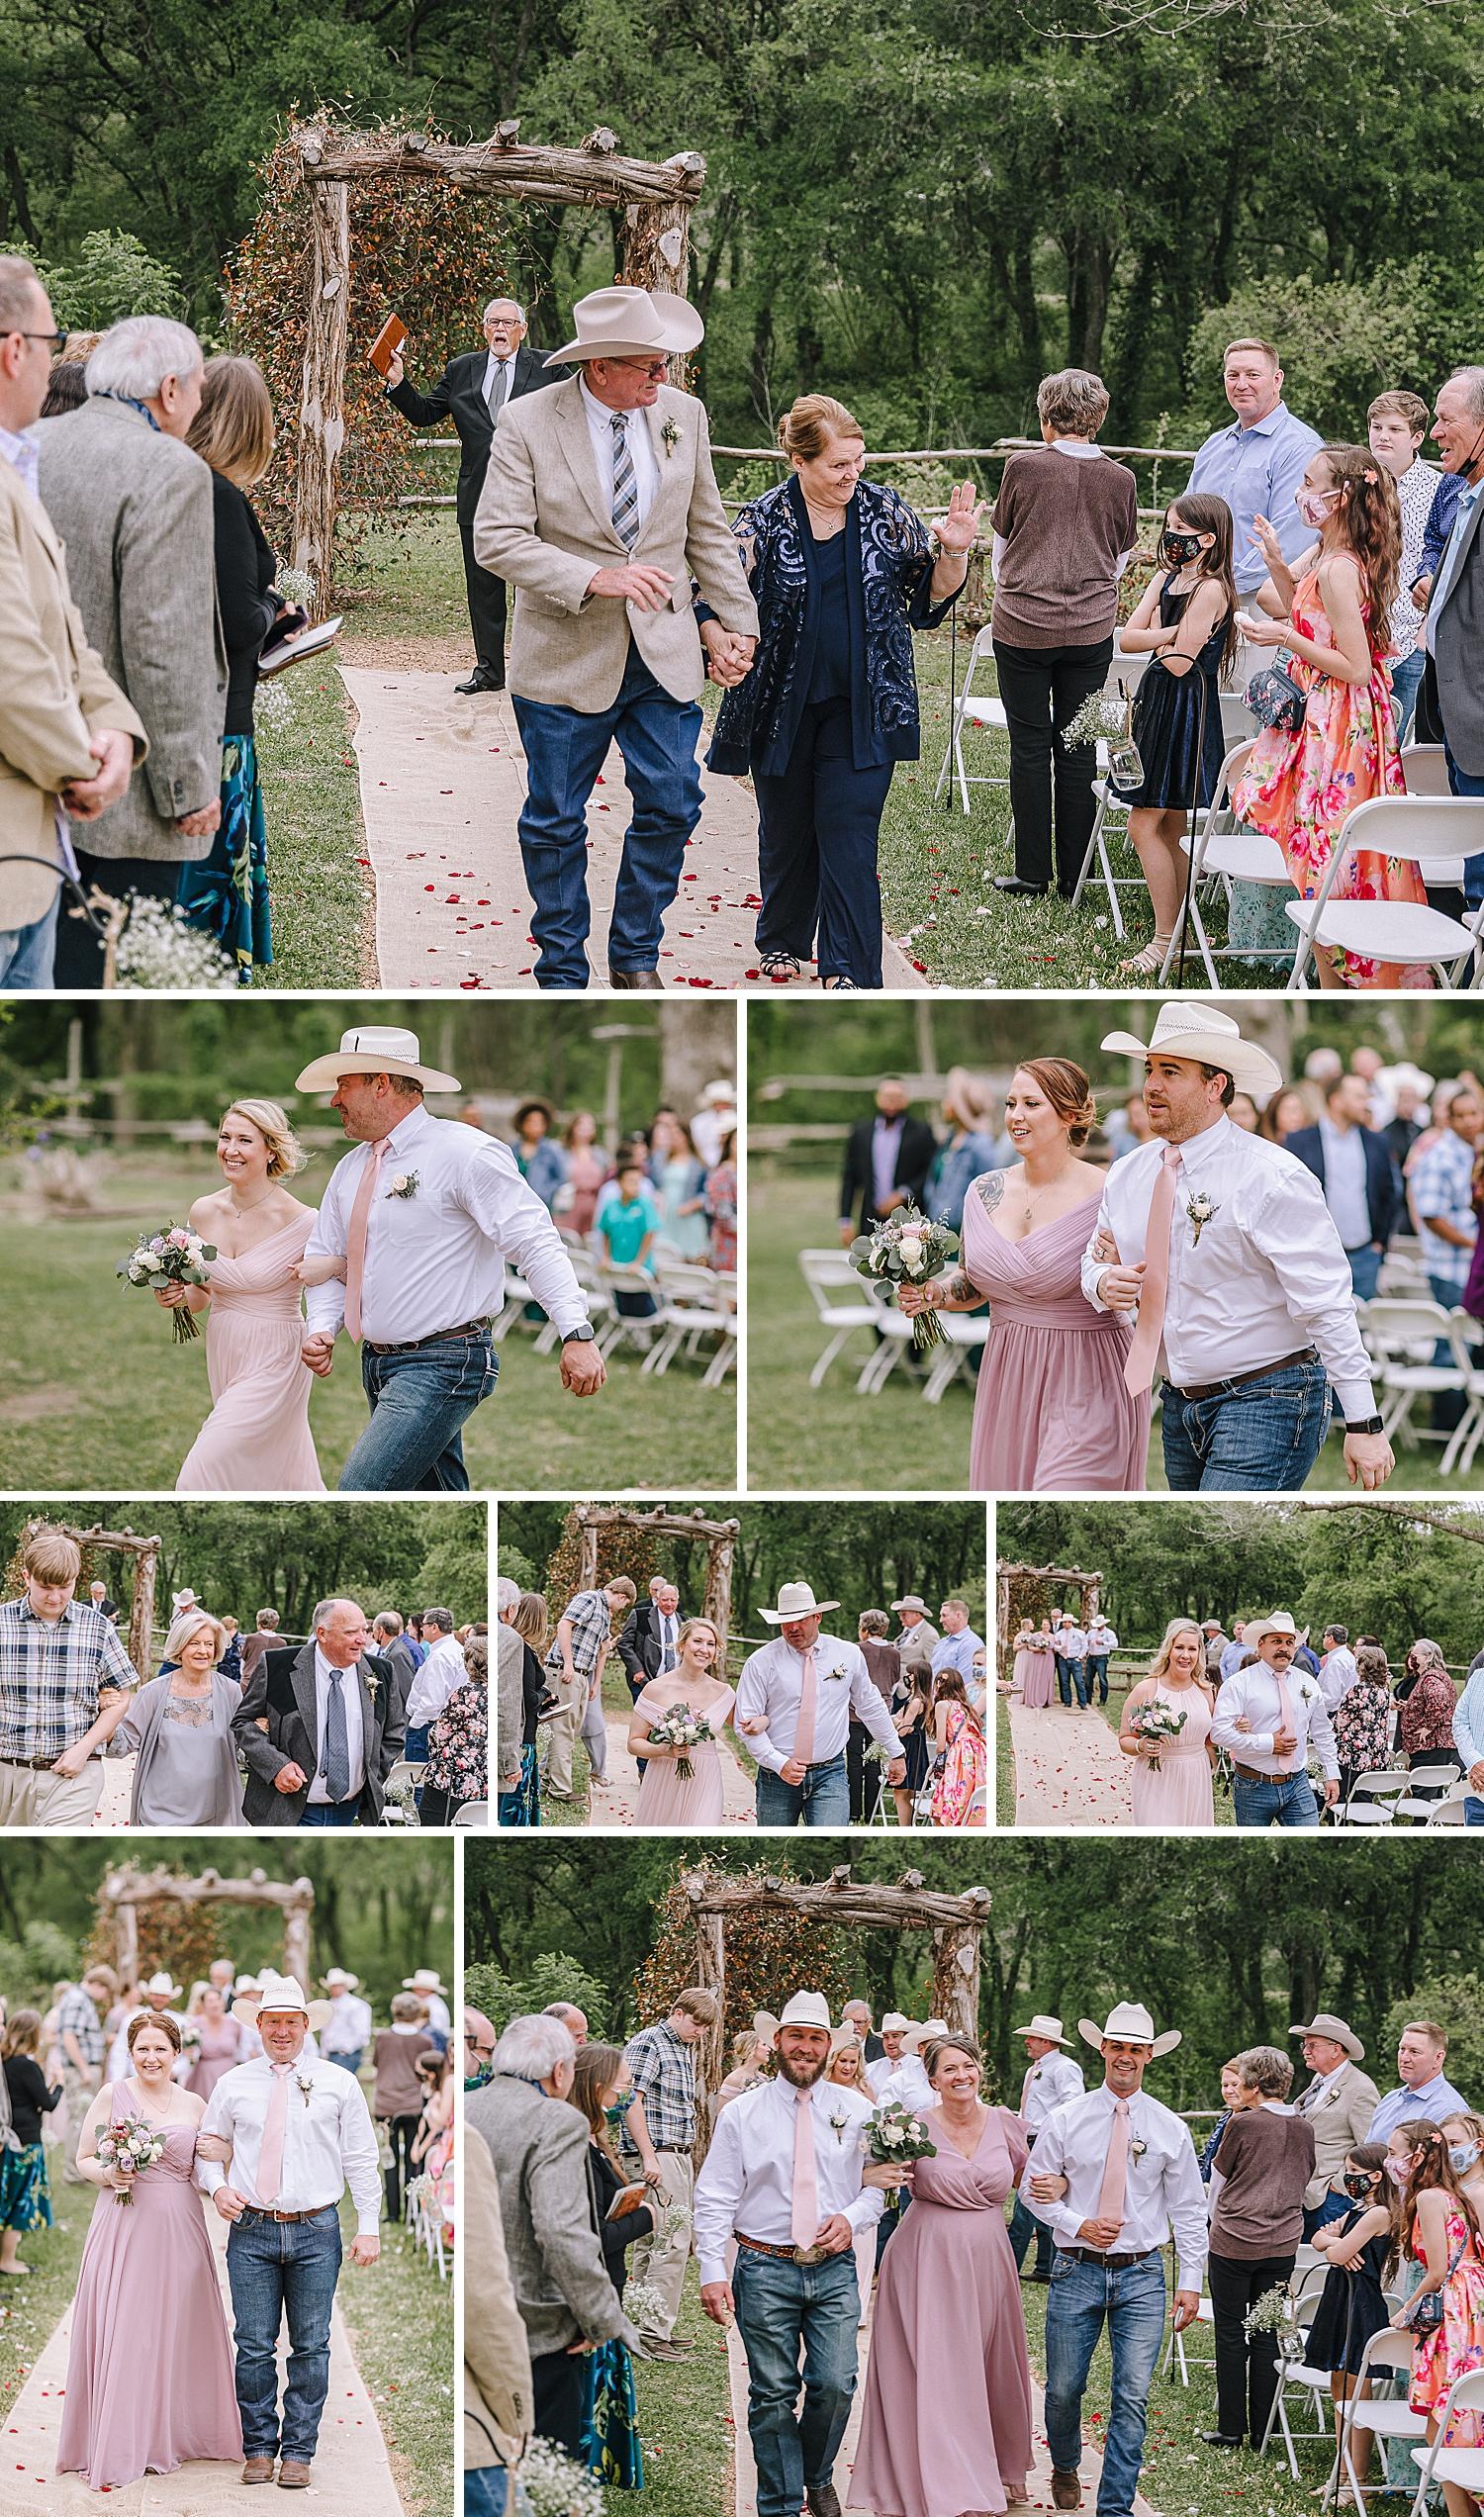 Rio-Cibilo-Ranch-Marion-Texas-Wedding-Rustic-Blush-Rose-Quartz-Details-Carly-Barton-Photography_0049.jpg